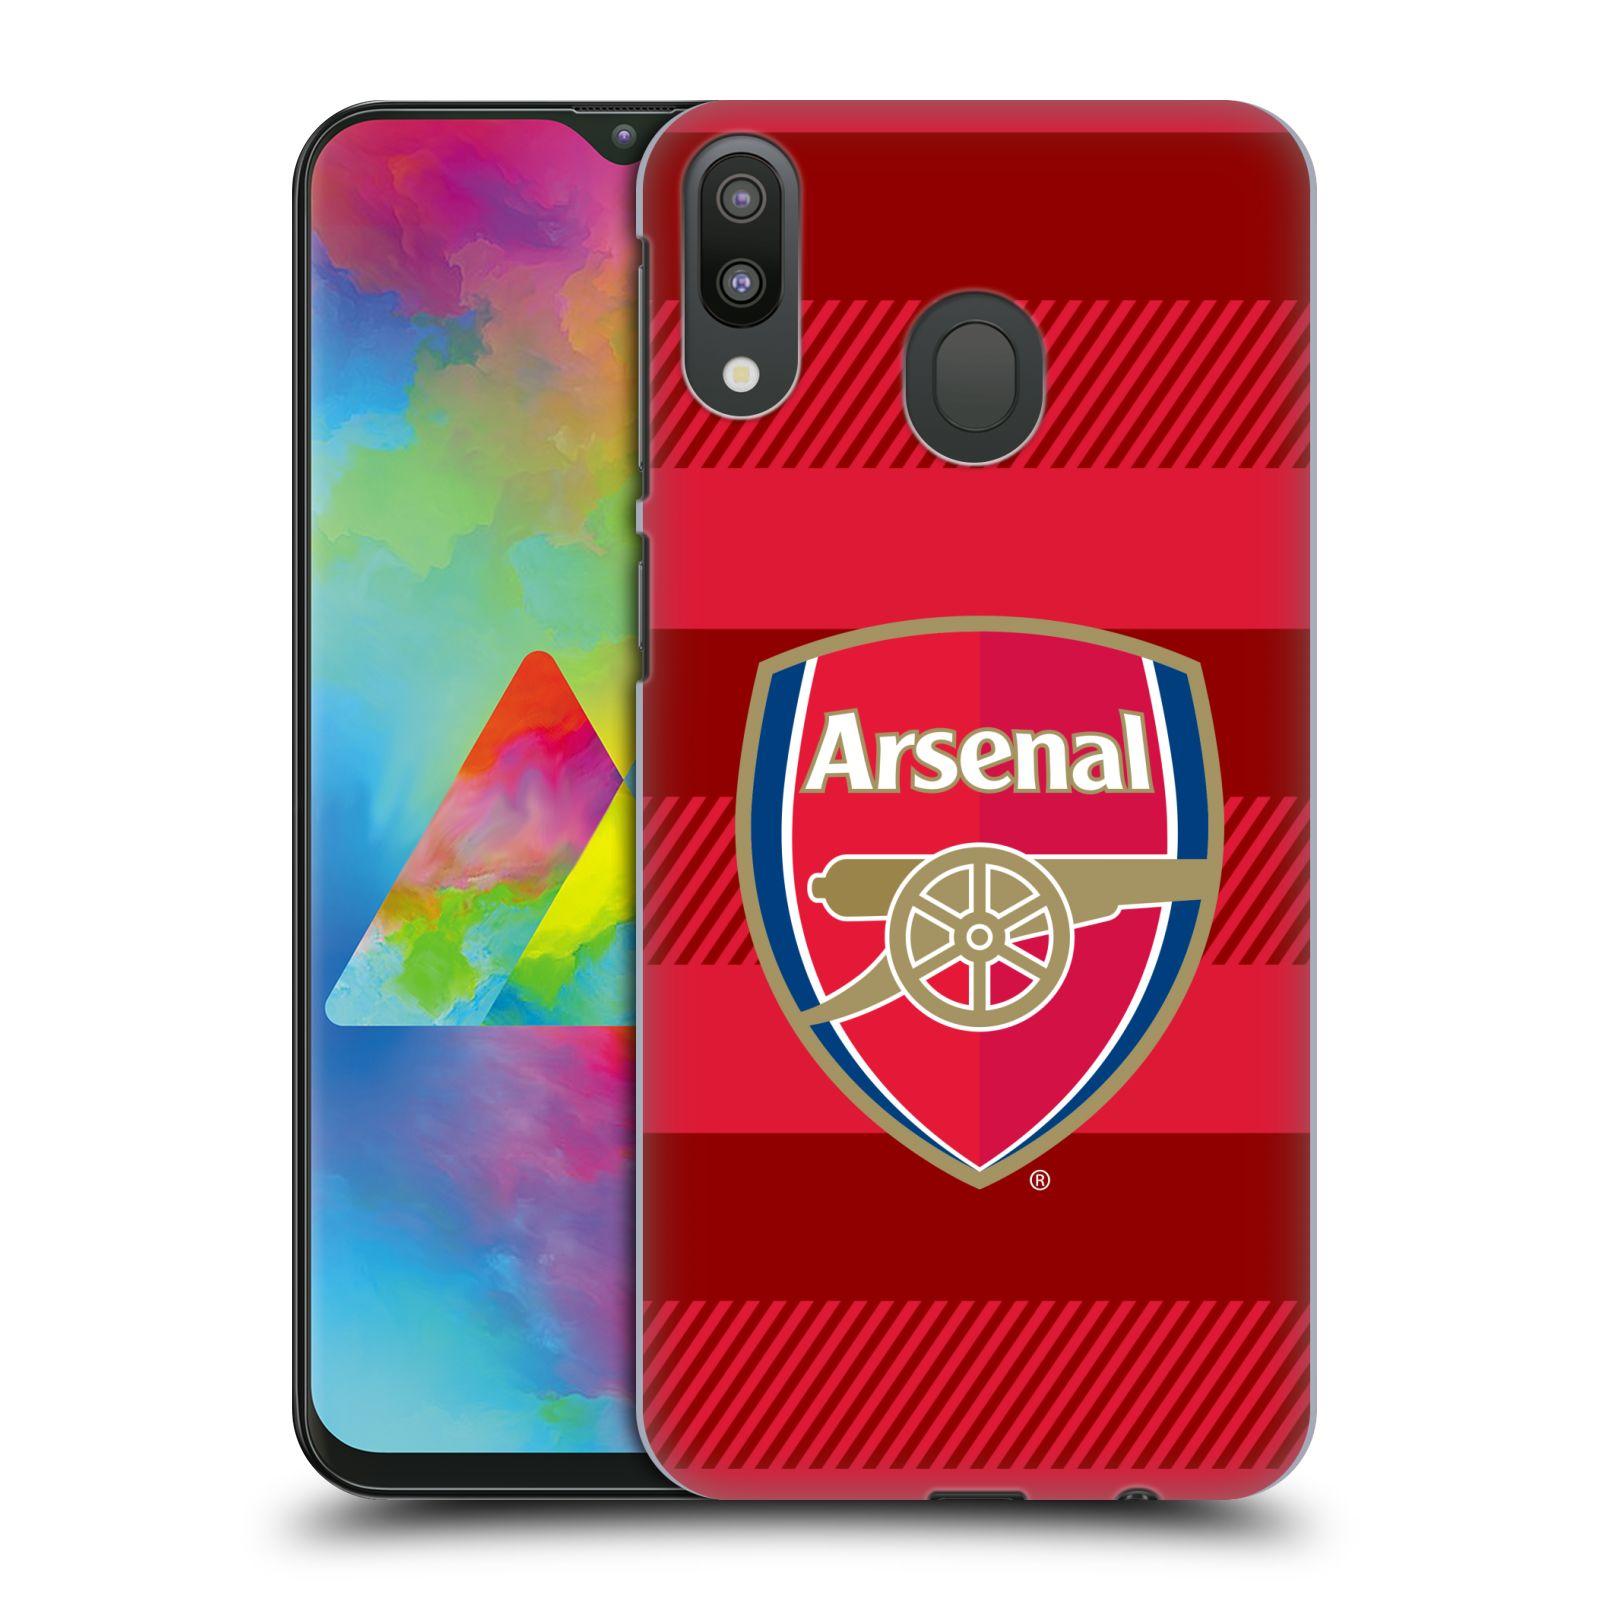 Plastové pouzdro na mobil Samsung Galaxy M20 - Head Case - Arsenal FC - Logo s pruhy